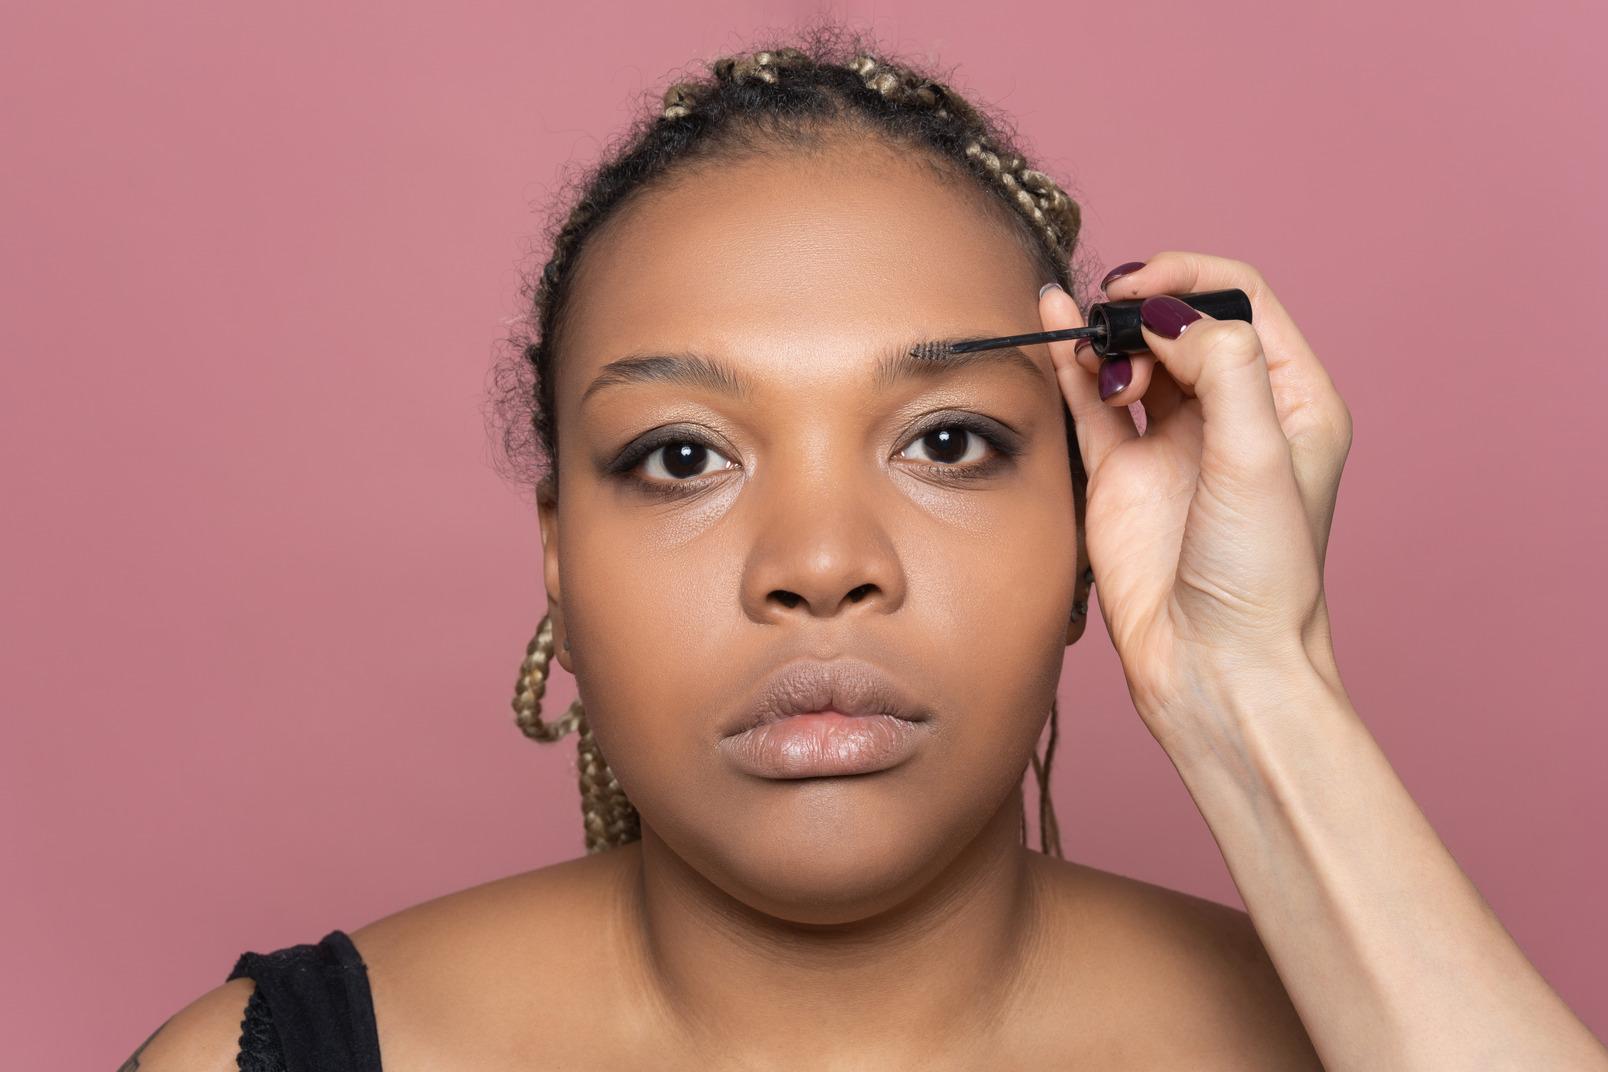 Adjusting eyebrows with brow gel